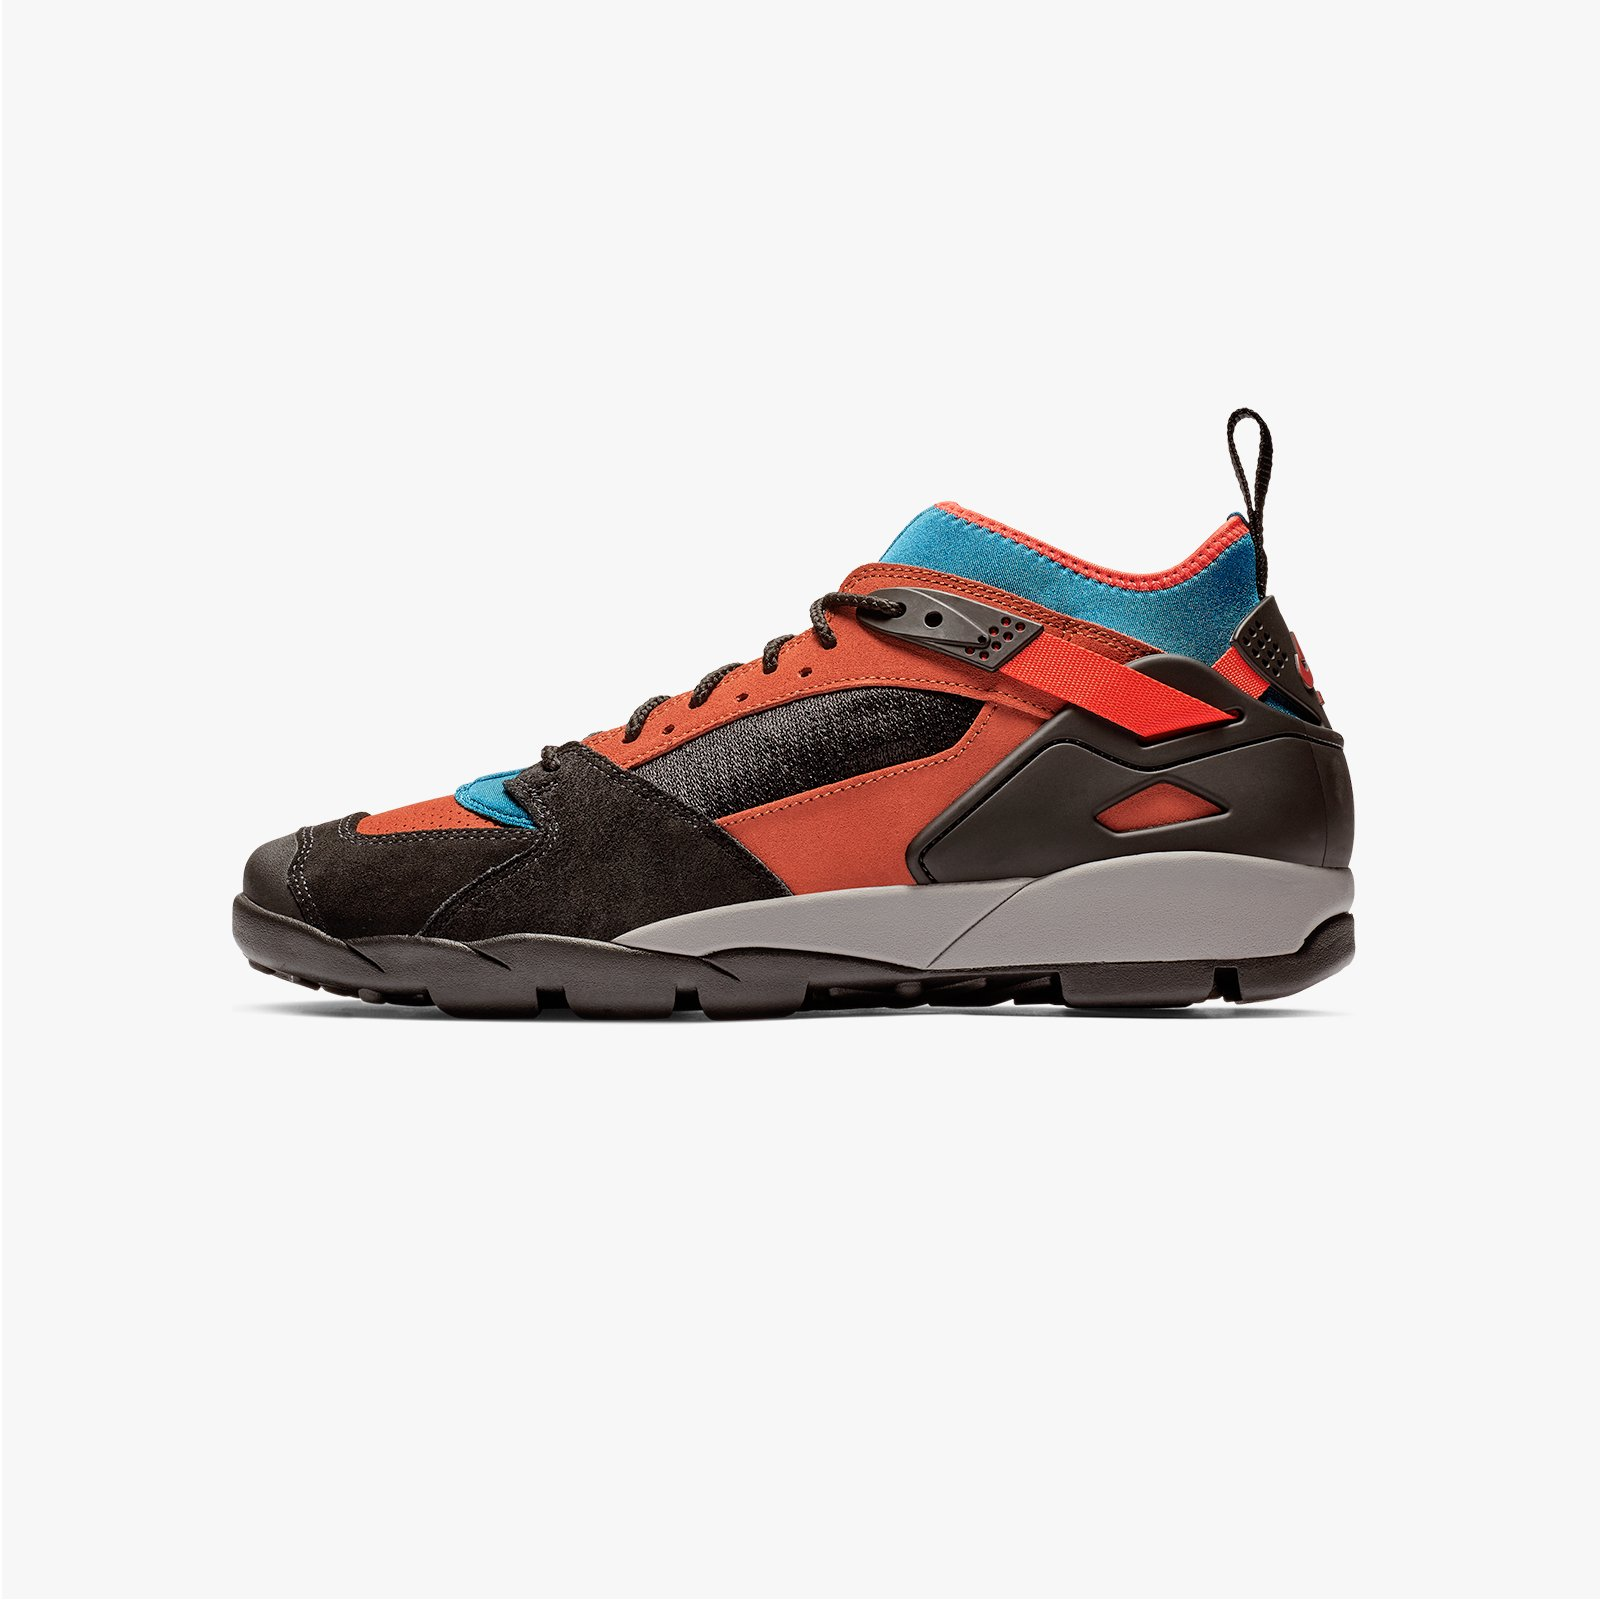 size 40 4c797 22b49 Nike Air Revaderchi - Ar0479-005 - Sneakersnstuff   sneakers   streetwear  online since 1999